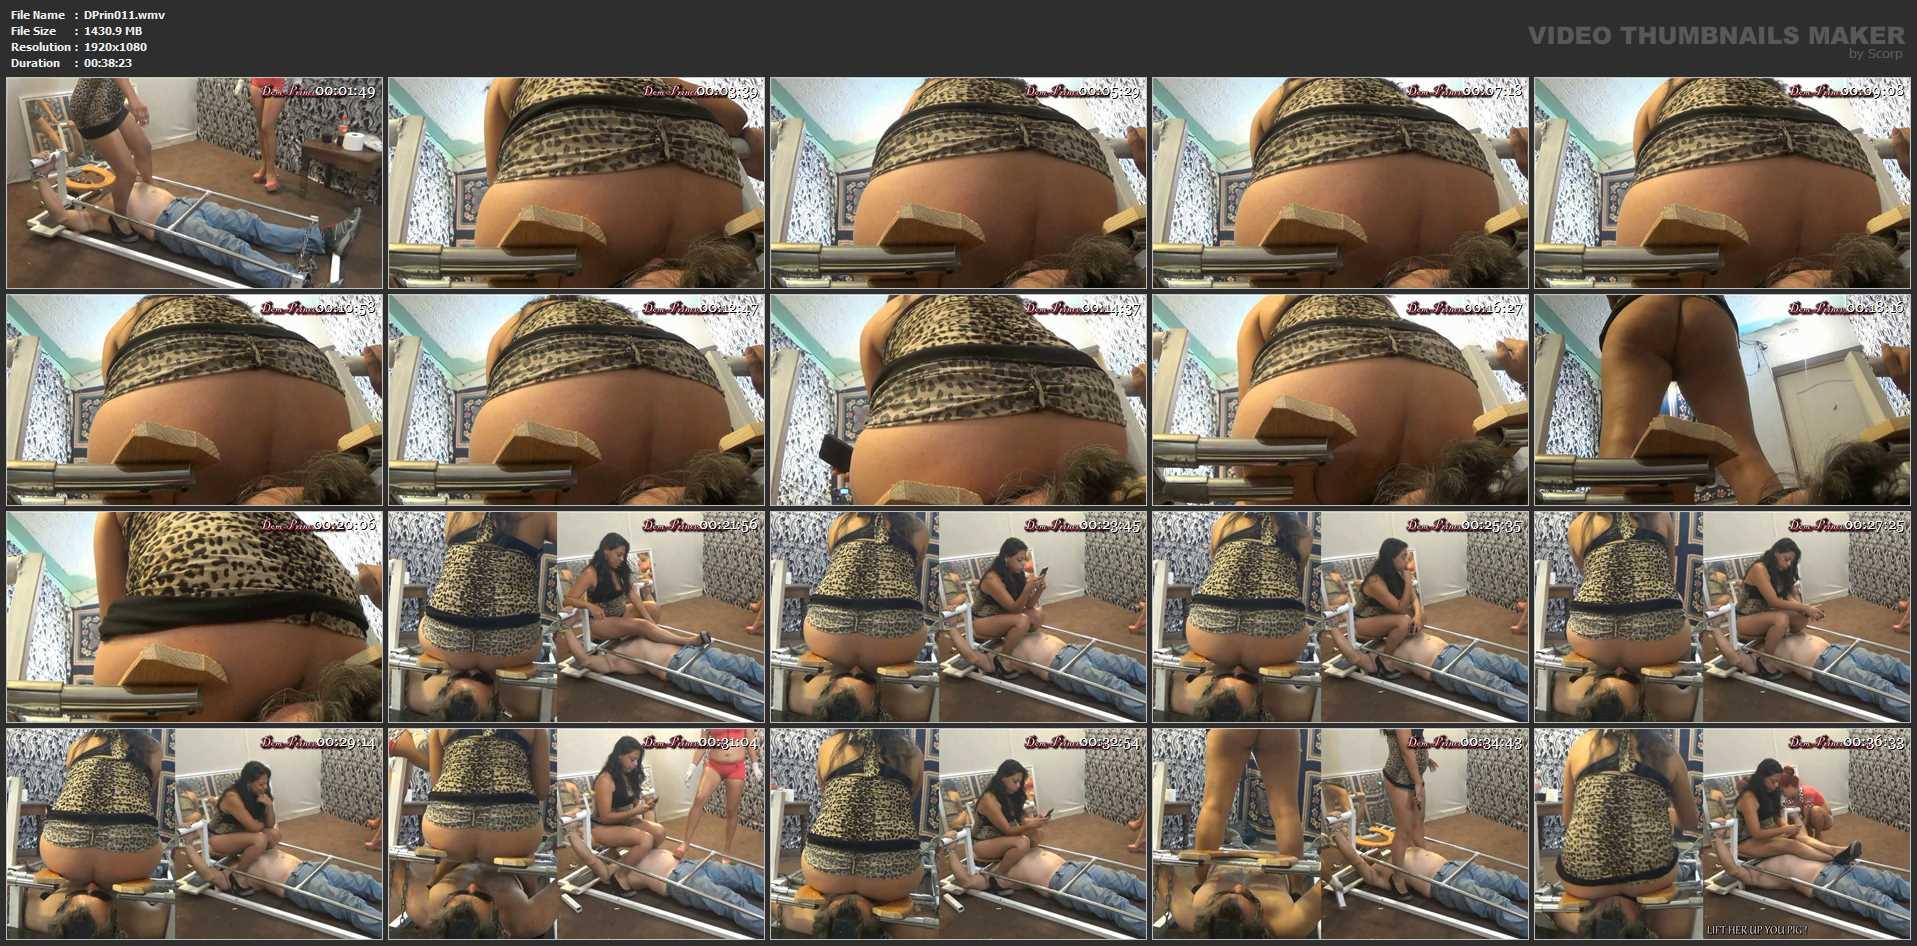 [DOM-PRINCESS] The Girl Lifter II Part 1 Diana [FULL HD][1080p][WMV]